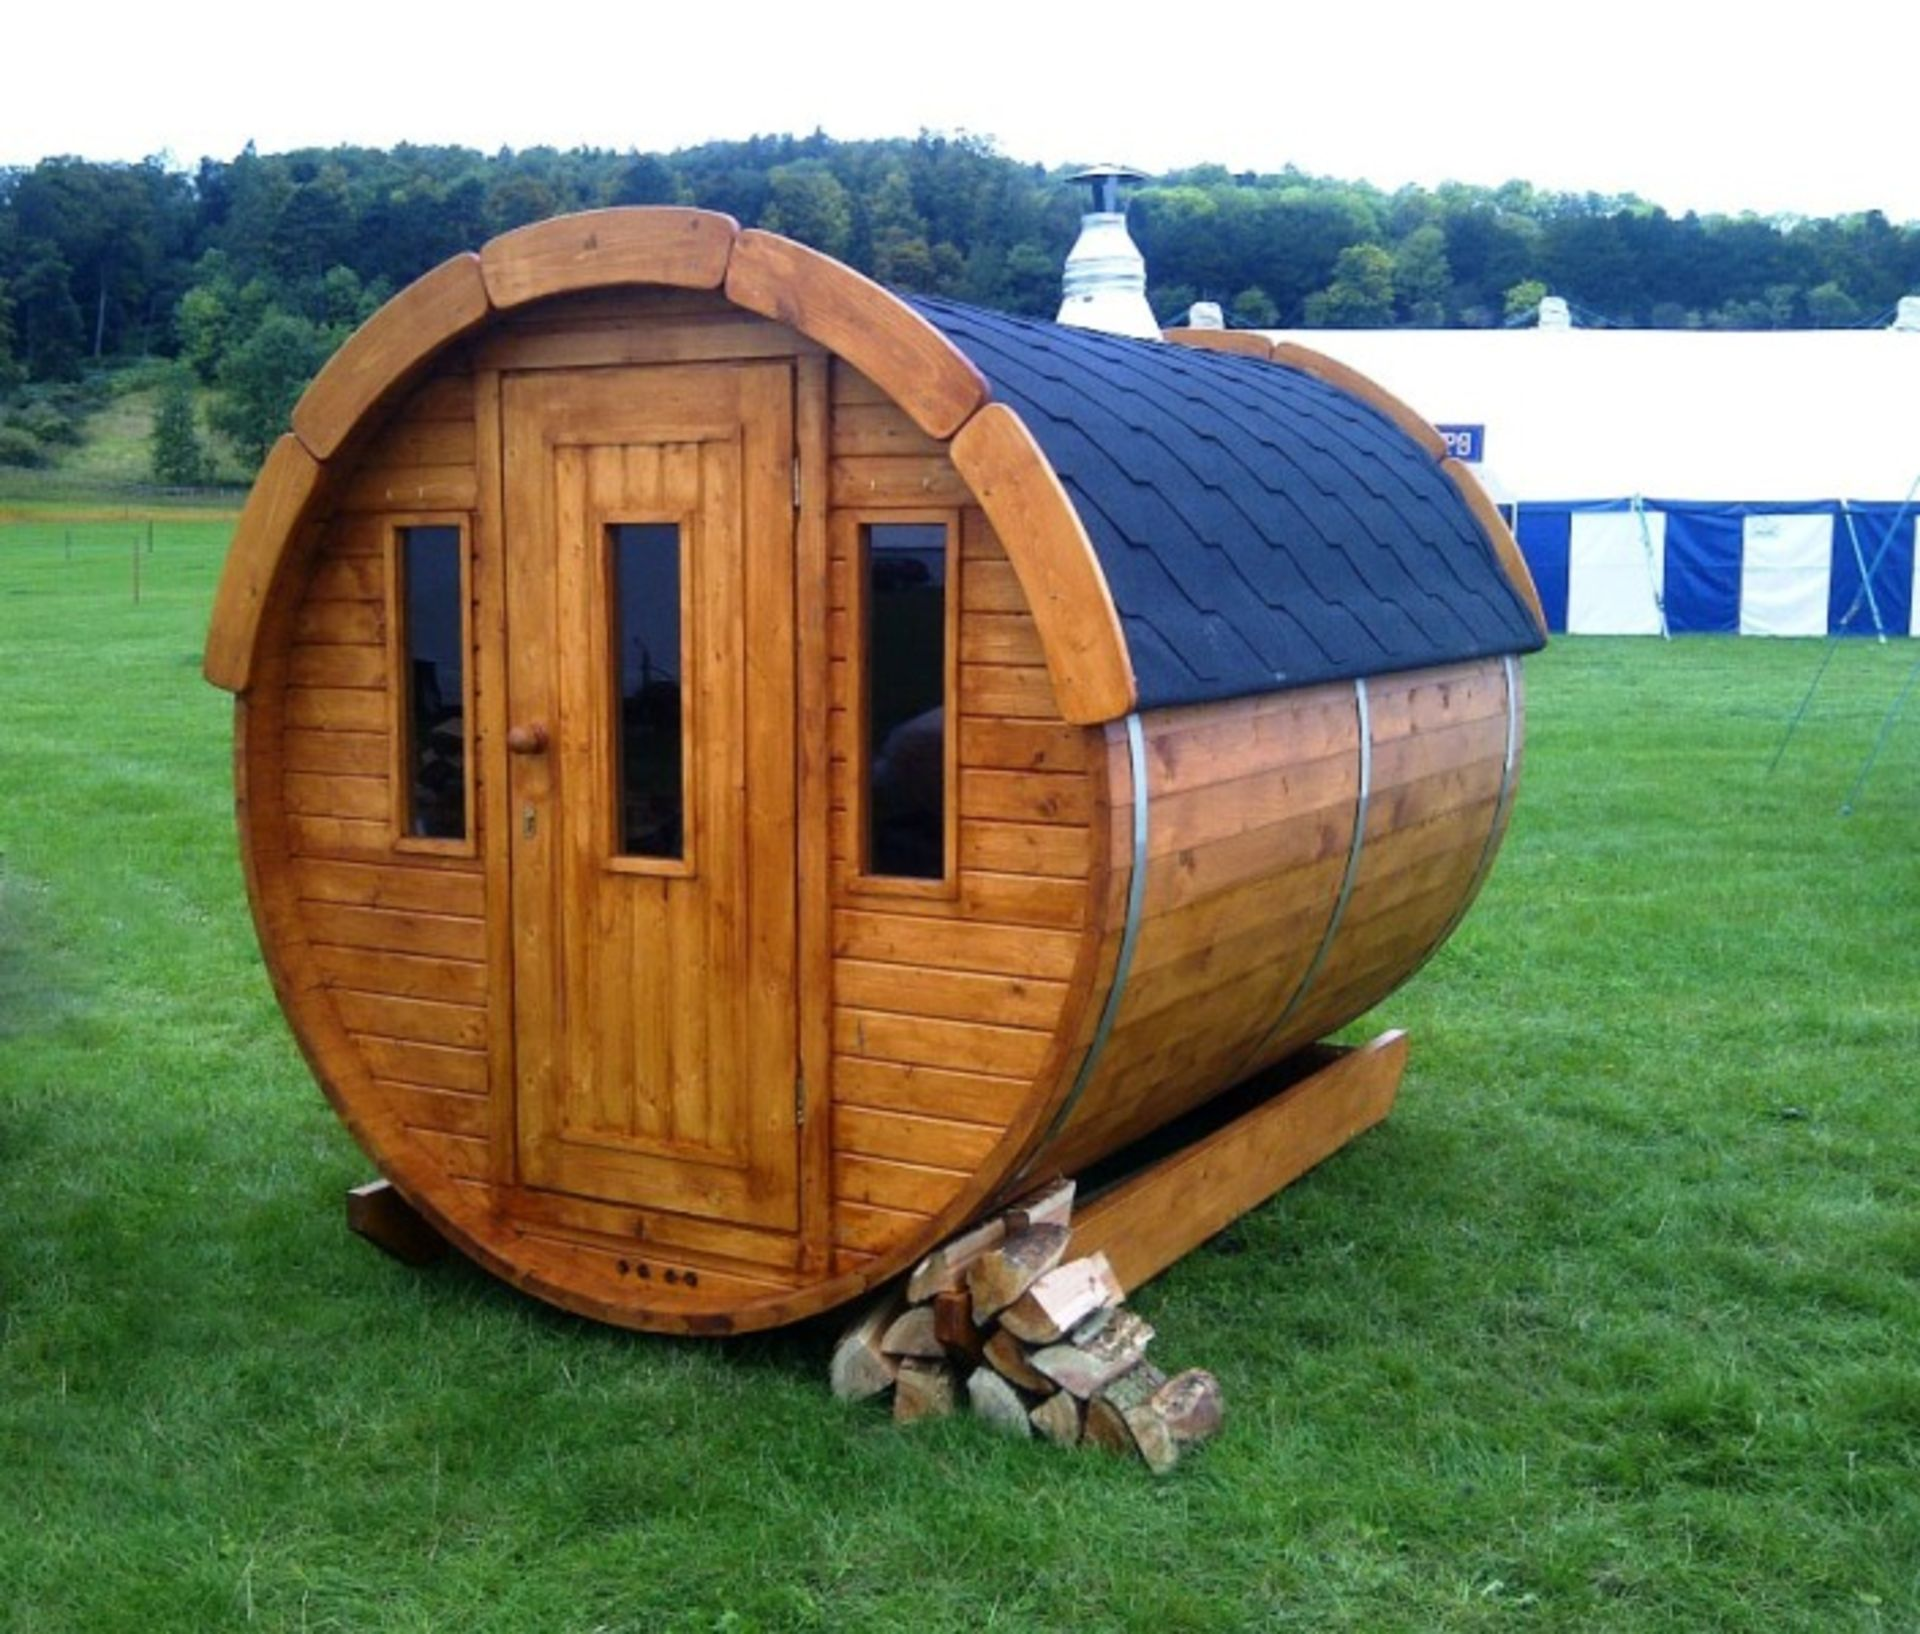 Lot 19029 - + VAT Brand New Superb 2m Garden Sauna Barrel *FULLY ASSEMBLED* - Powerful Harvia Electric Heater -